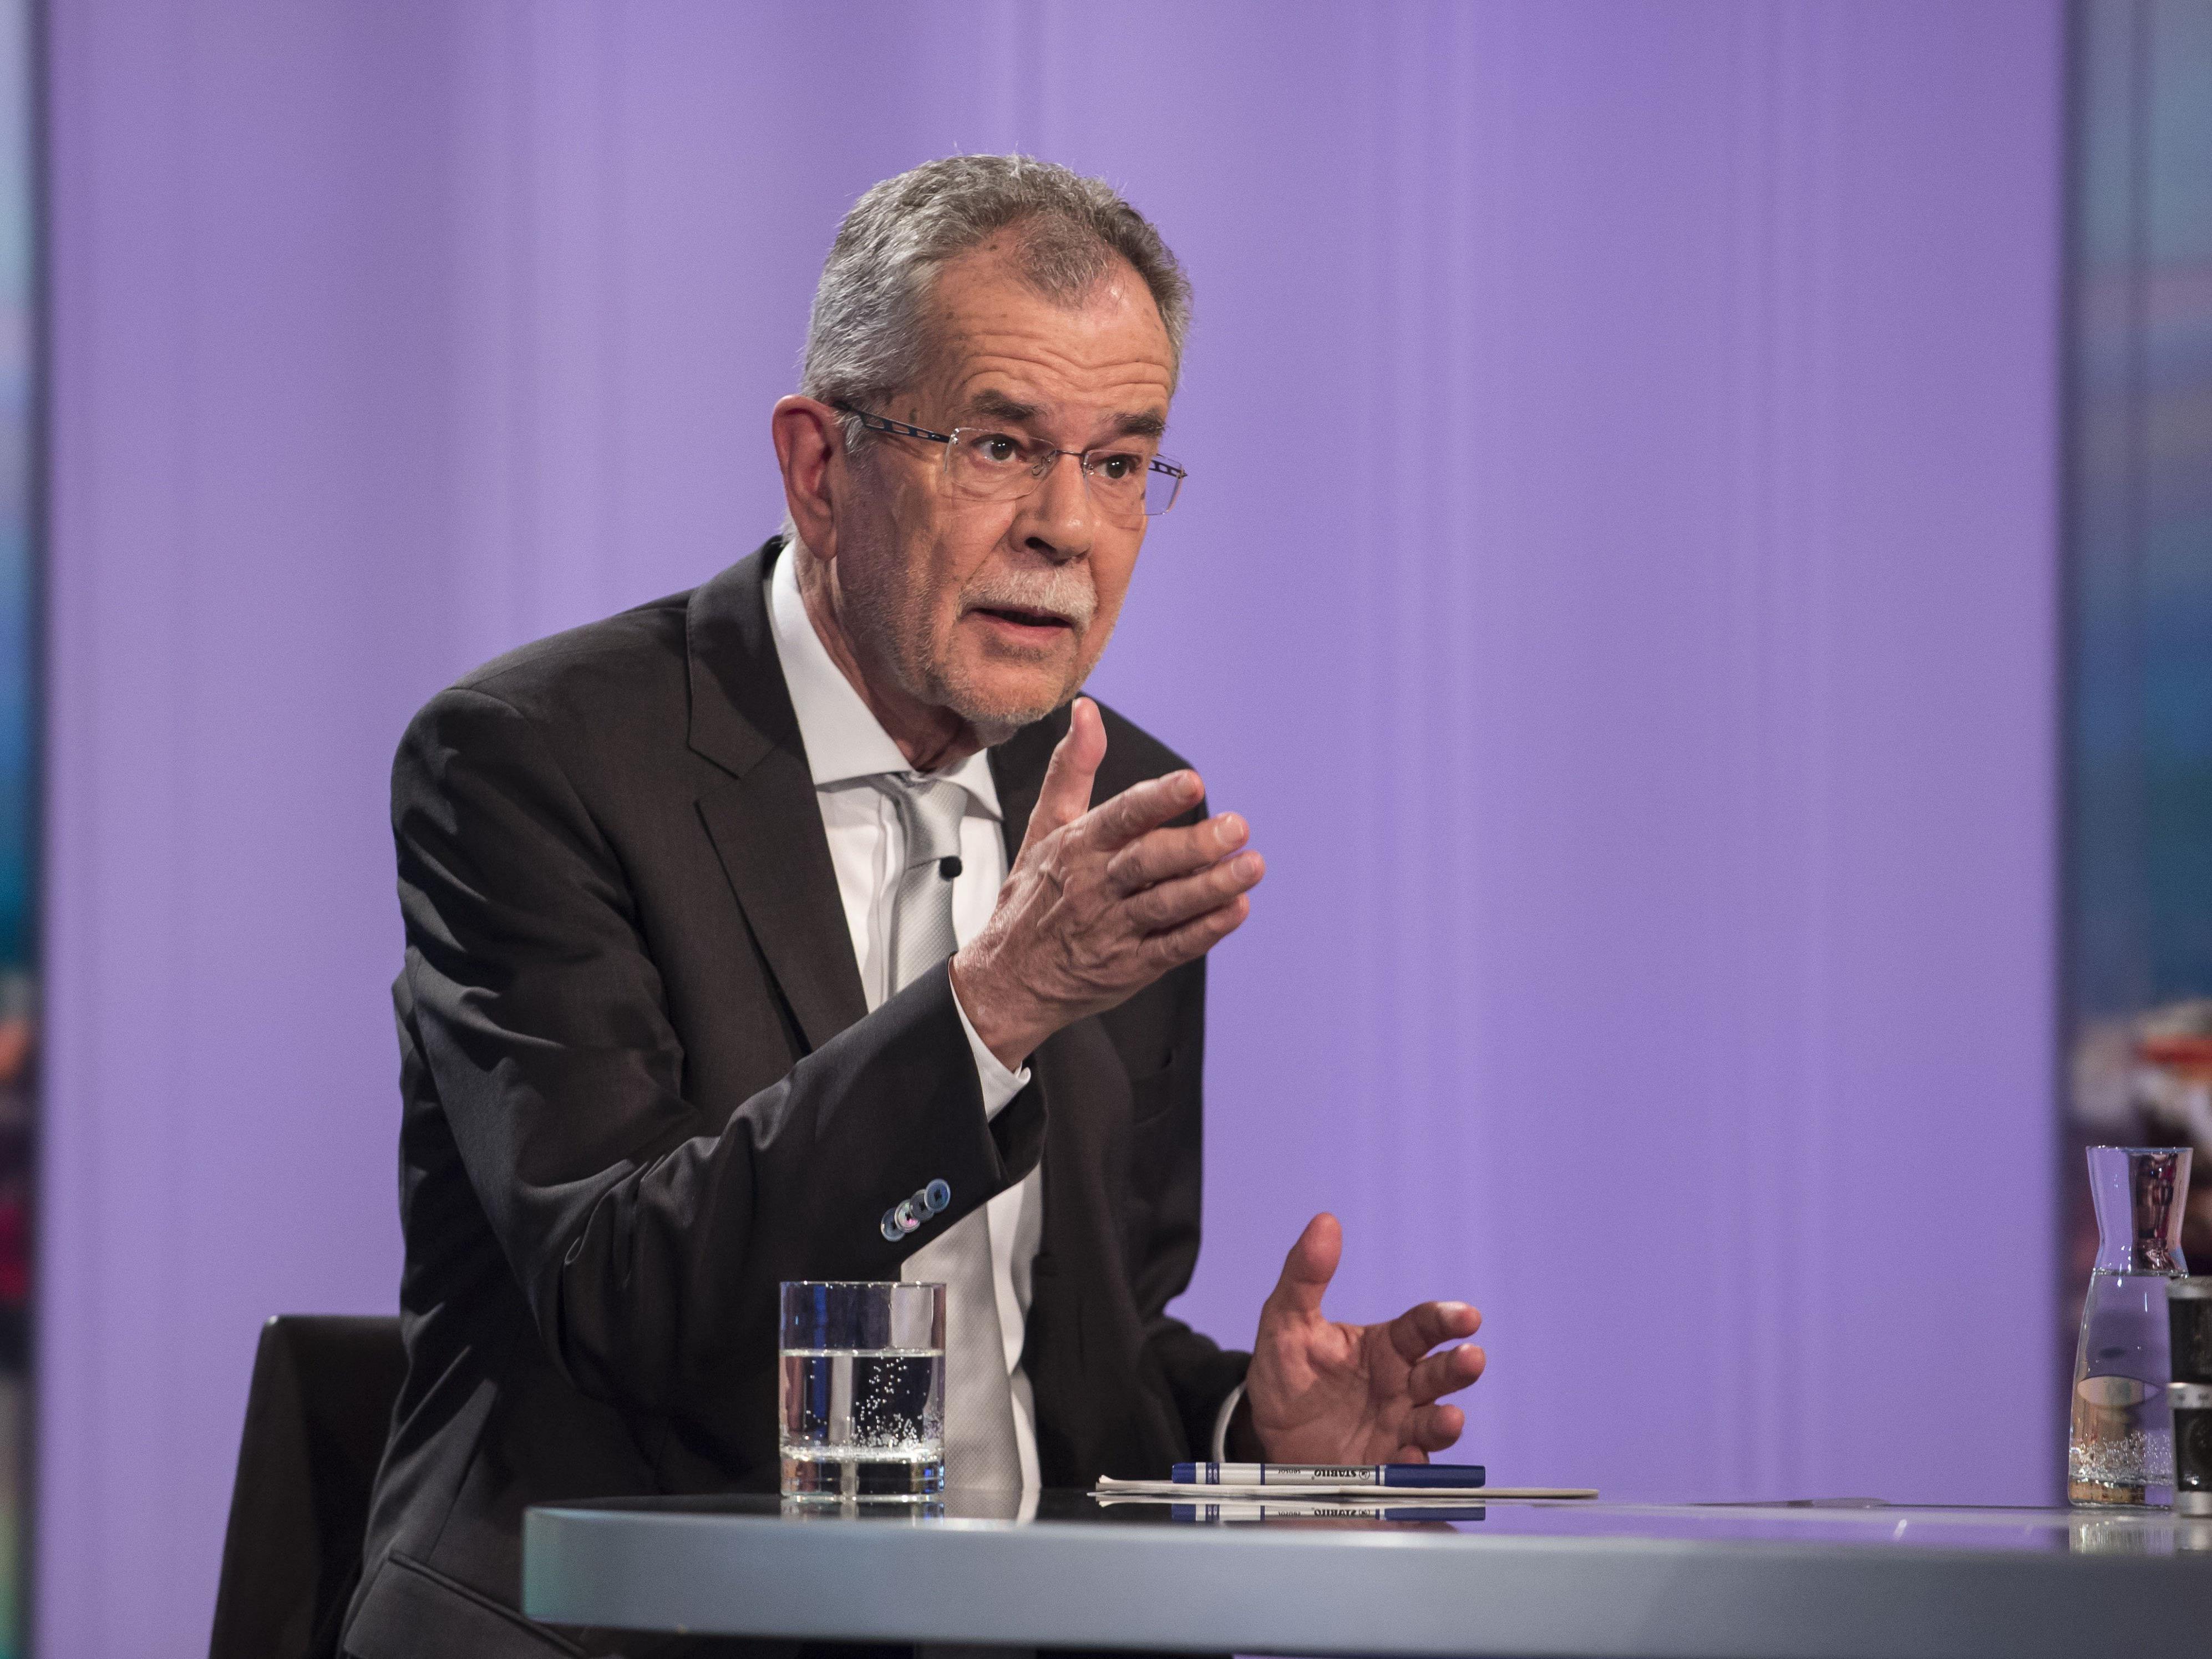 BP-Wahl - Flüchtlingskrise dominierte Pressestunde mit Van der Bellen